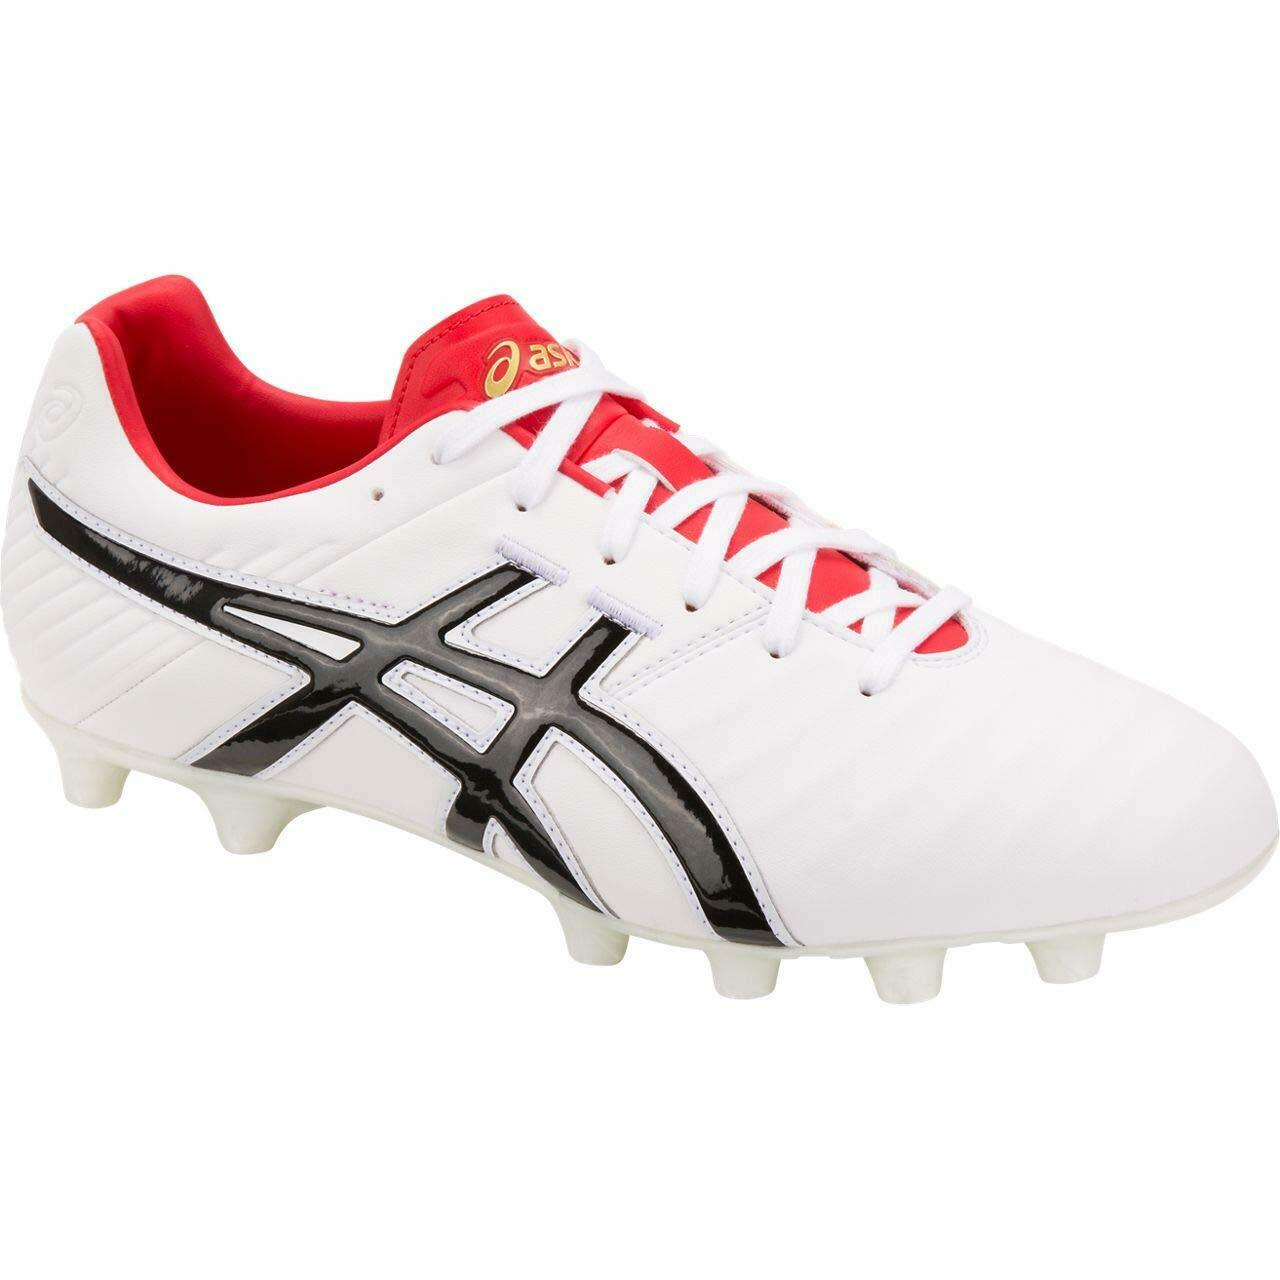 Zapatillas Asics Fútbol Rugby Spike DS Light WD 3 TSI753 TSI753 TSI753 blancooo Negro US9 (27cm) e21a73